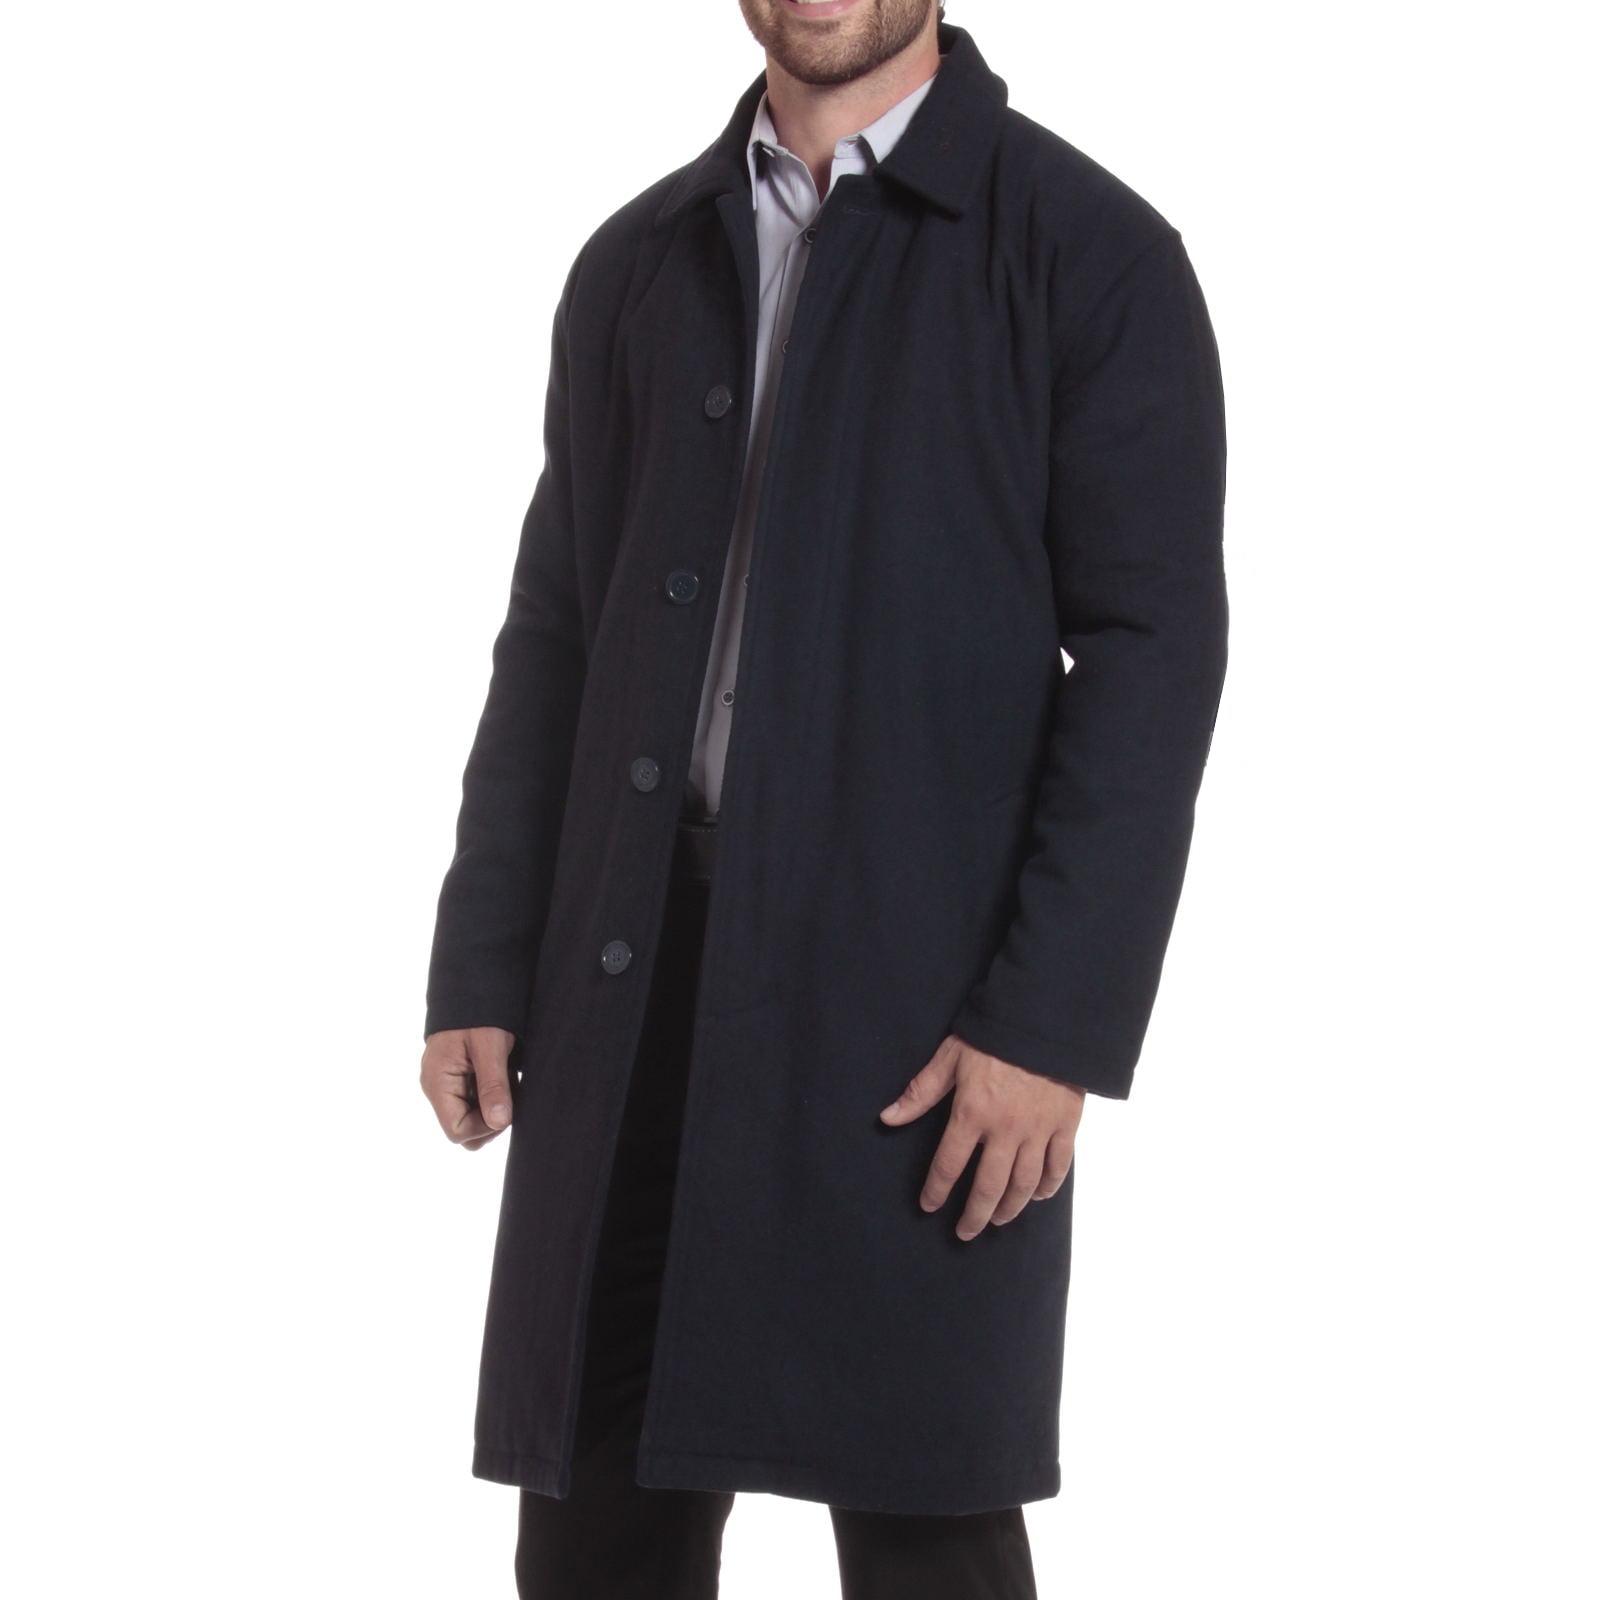 Alpine Swiss Men's Zach Knee Length Jacket Top Coat Trench Wool Blend Overcoat by Mens Wool Coats